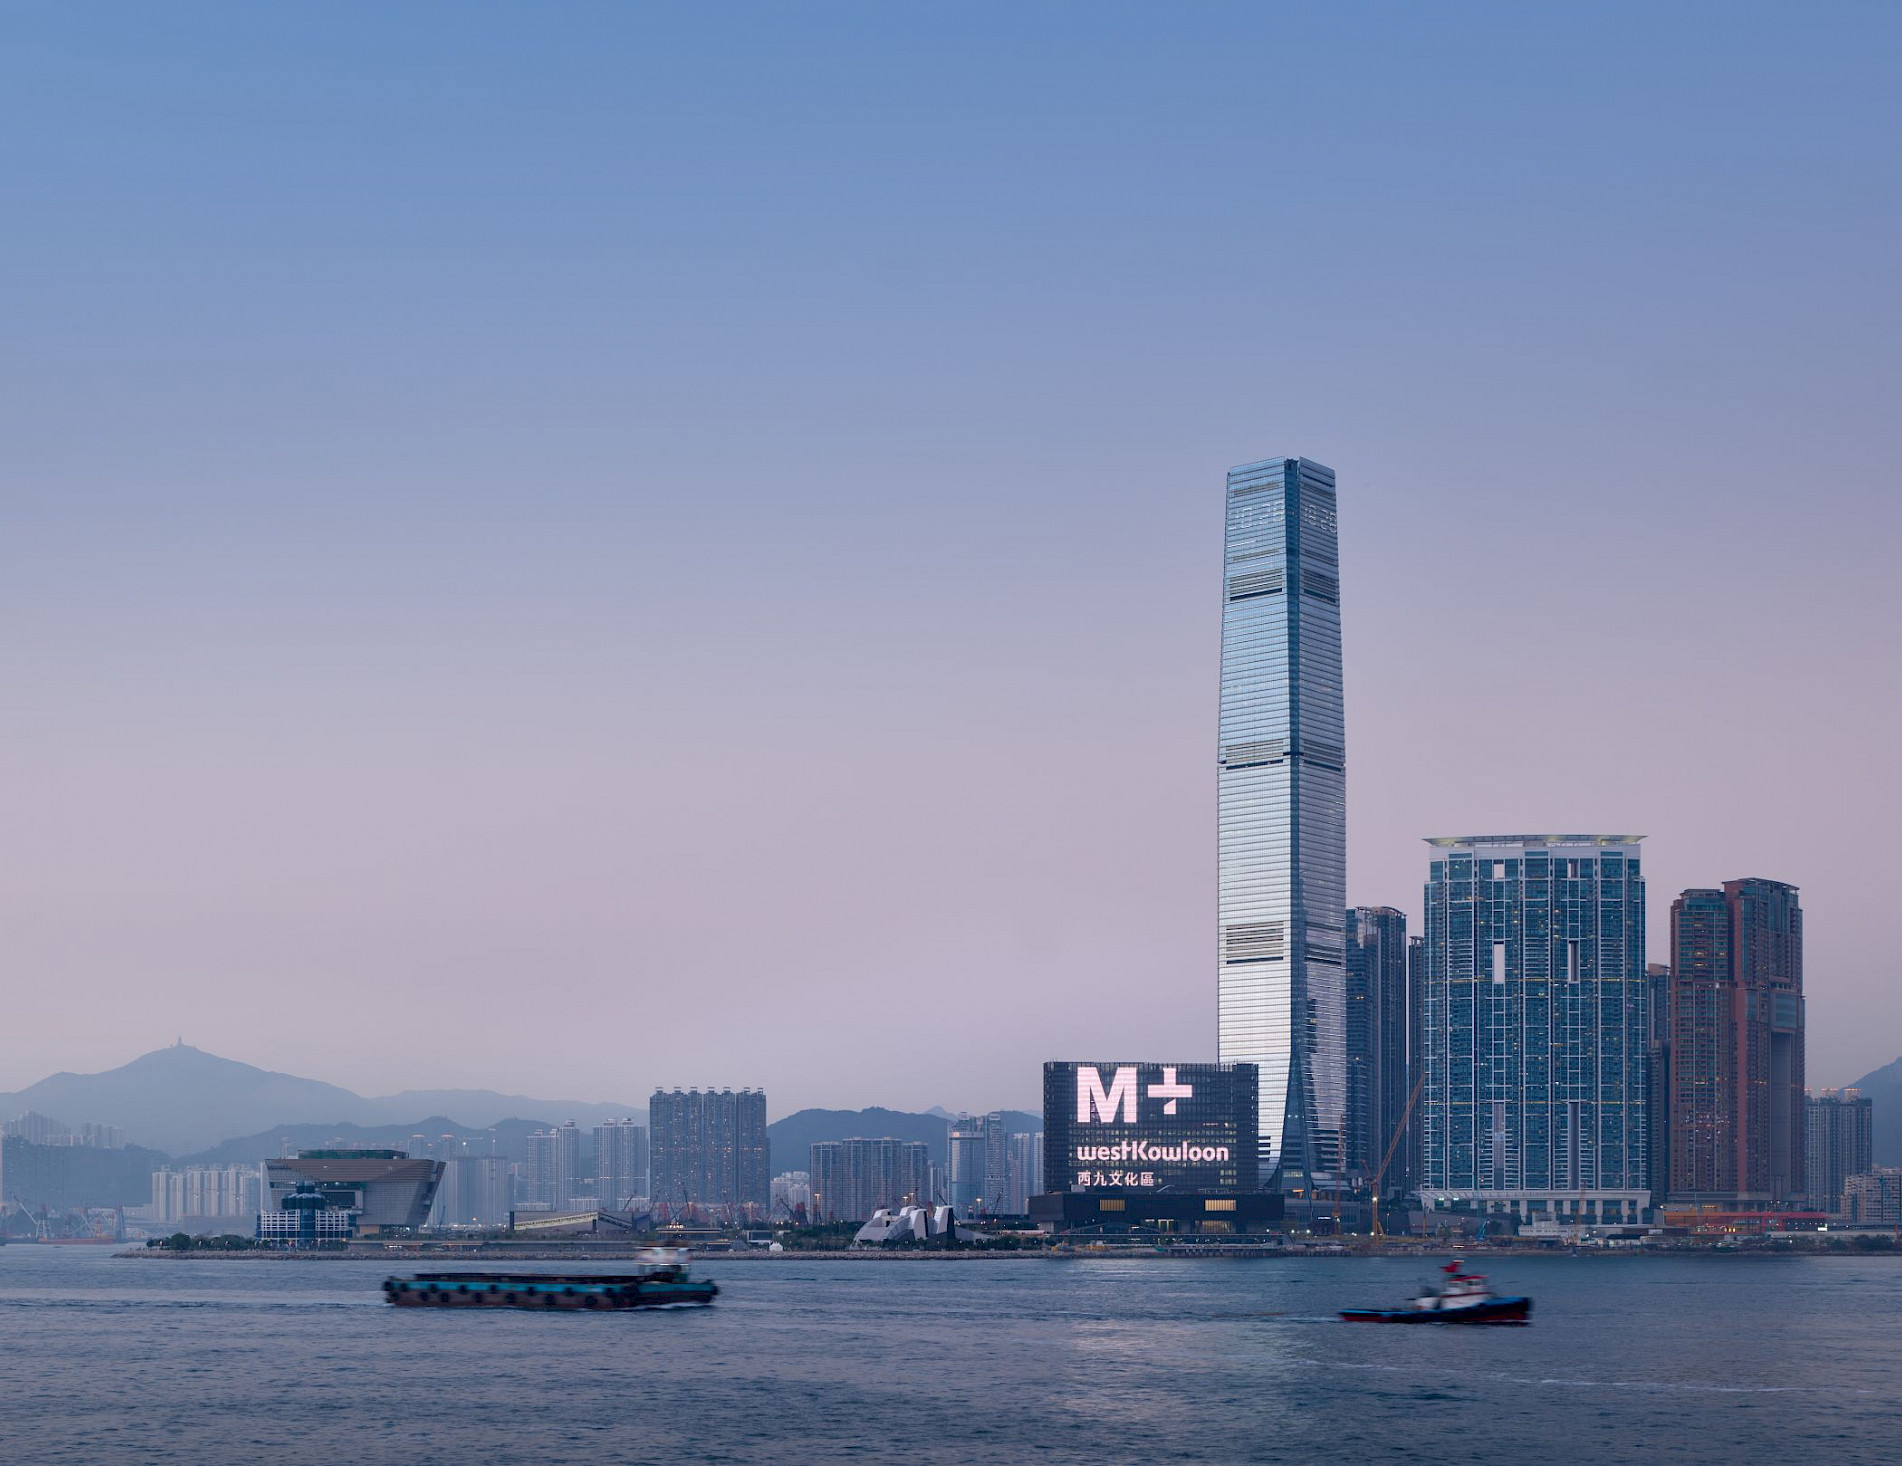 No Oscars or sensitive art spark Hong Kong censorship fears